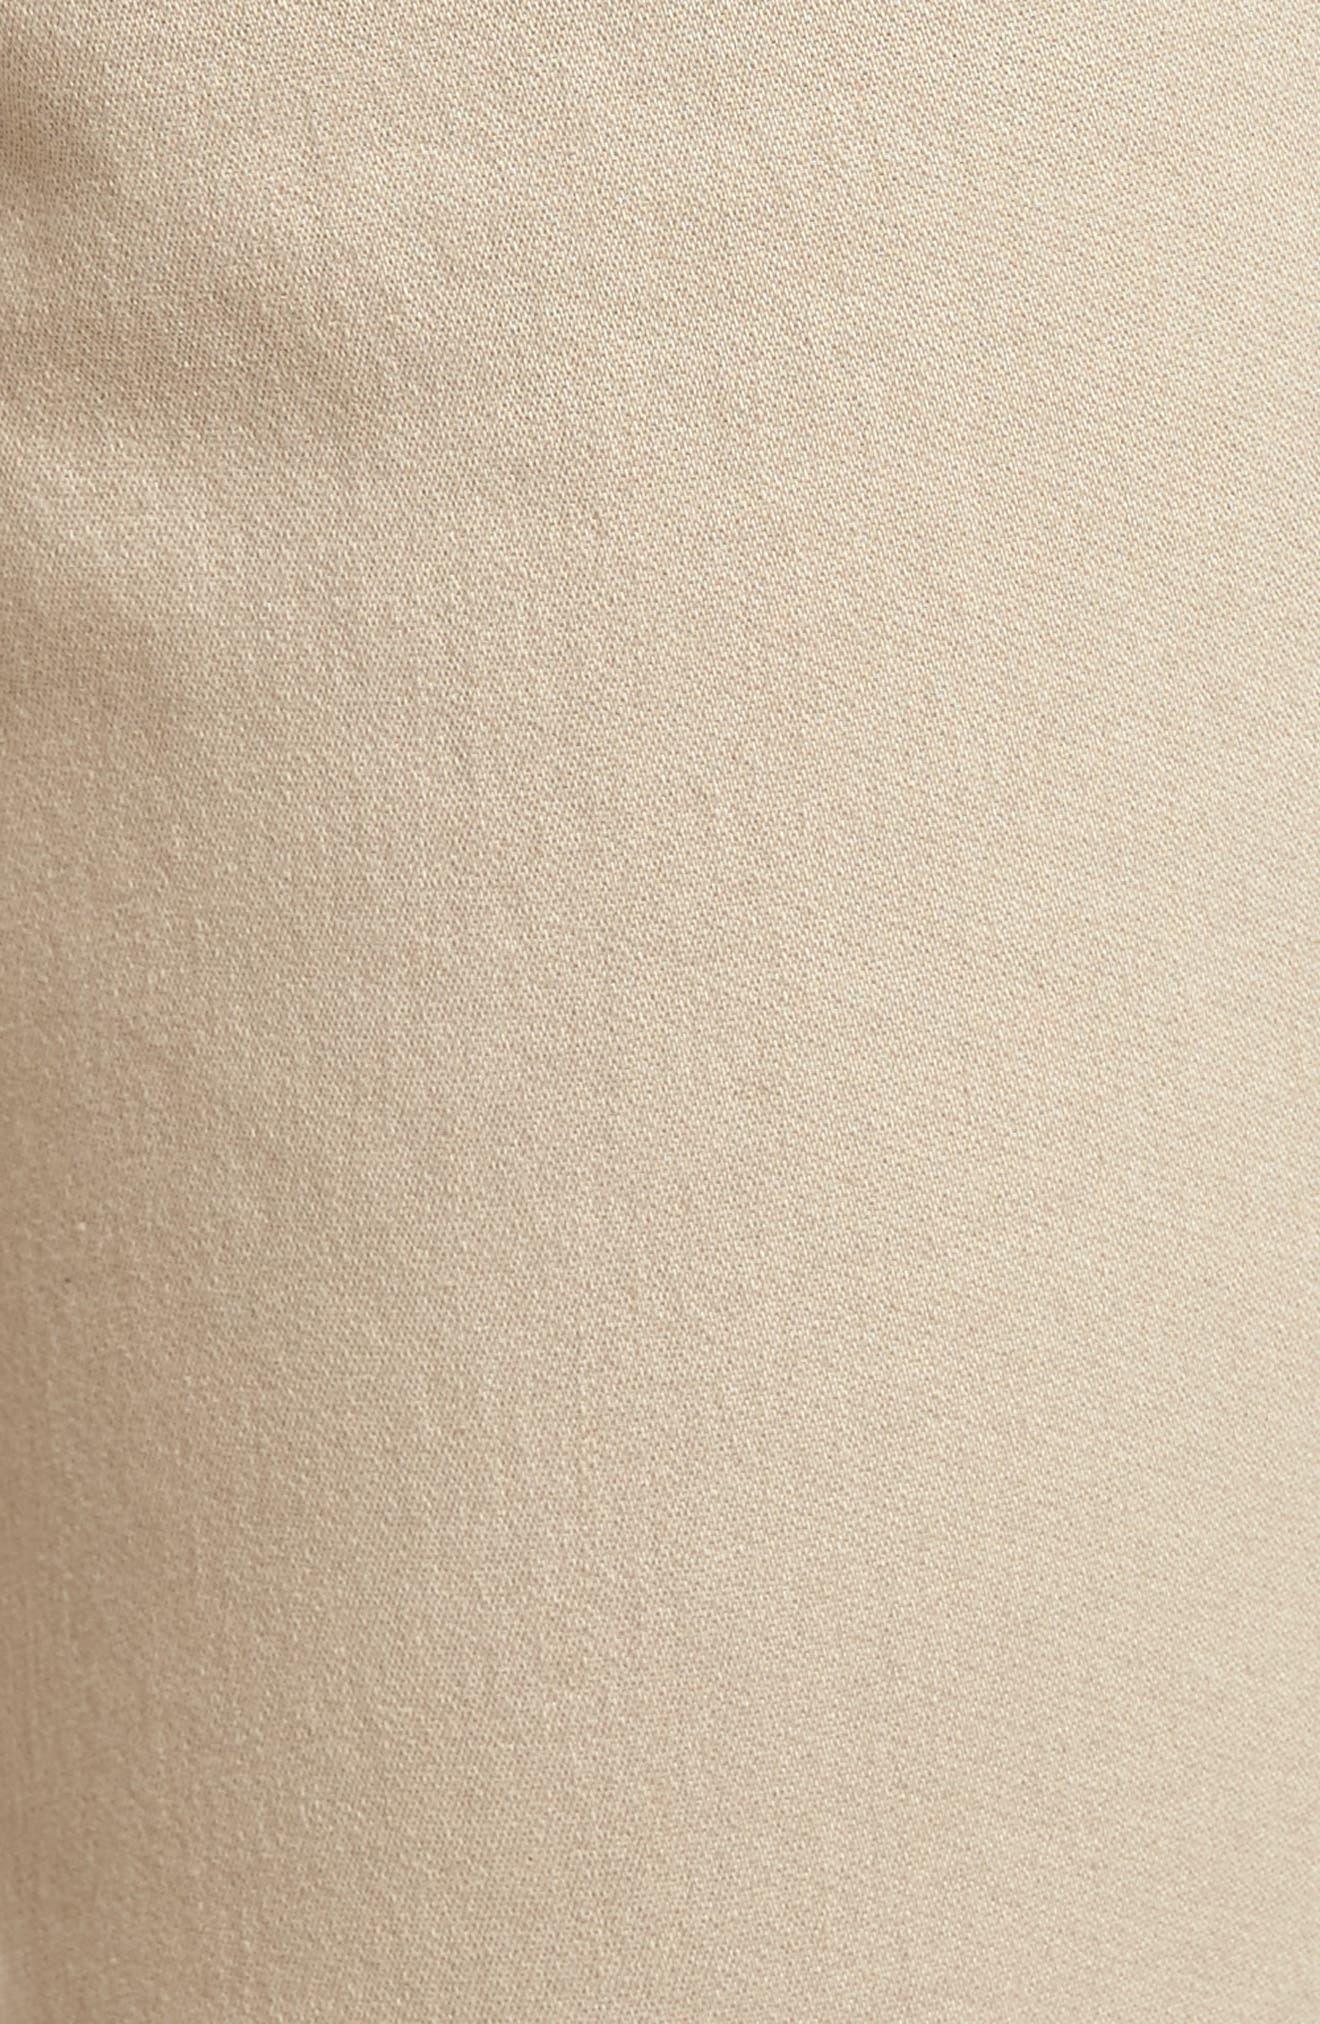 Ryan Knit Skinny Jeans,                             Alternate thumbnail 5, color,                             Birchwood